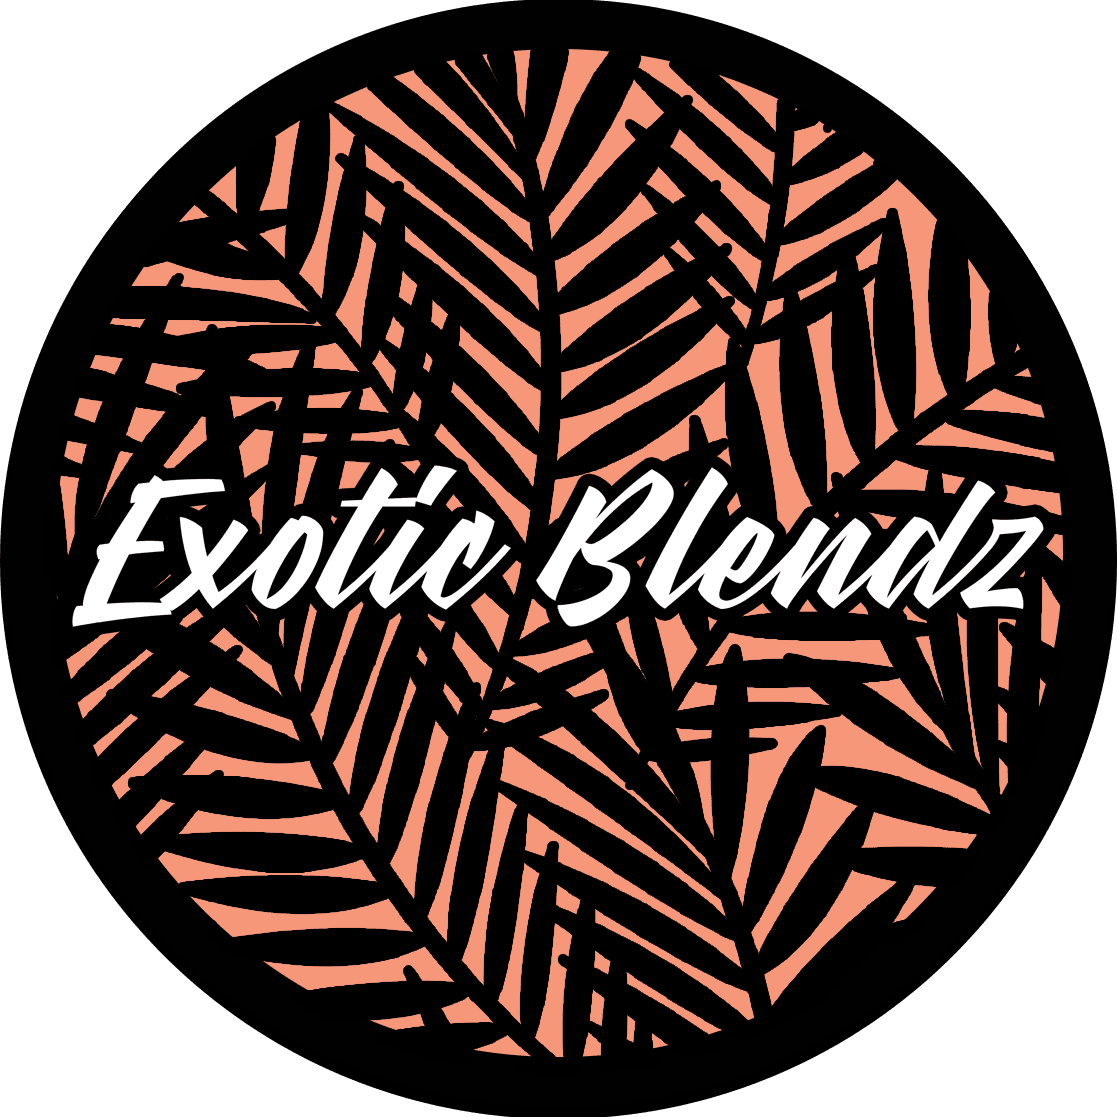 Exotic Blendz